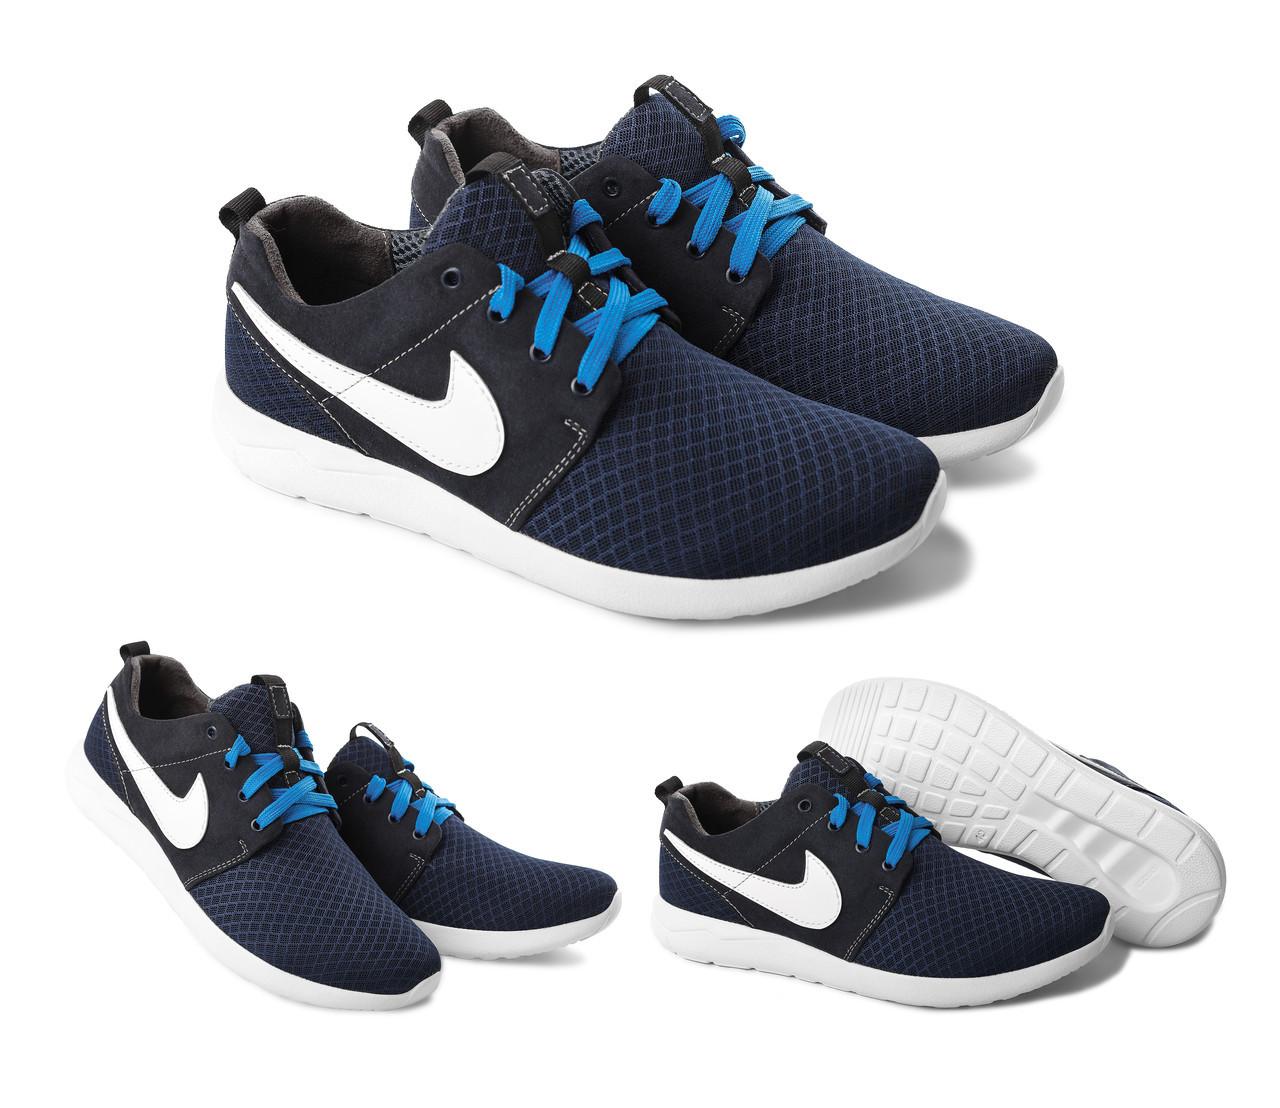 137210a9039d Кроссовки летние Nike. Украина - Интернет-магазин